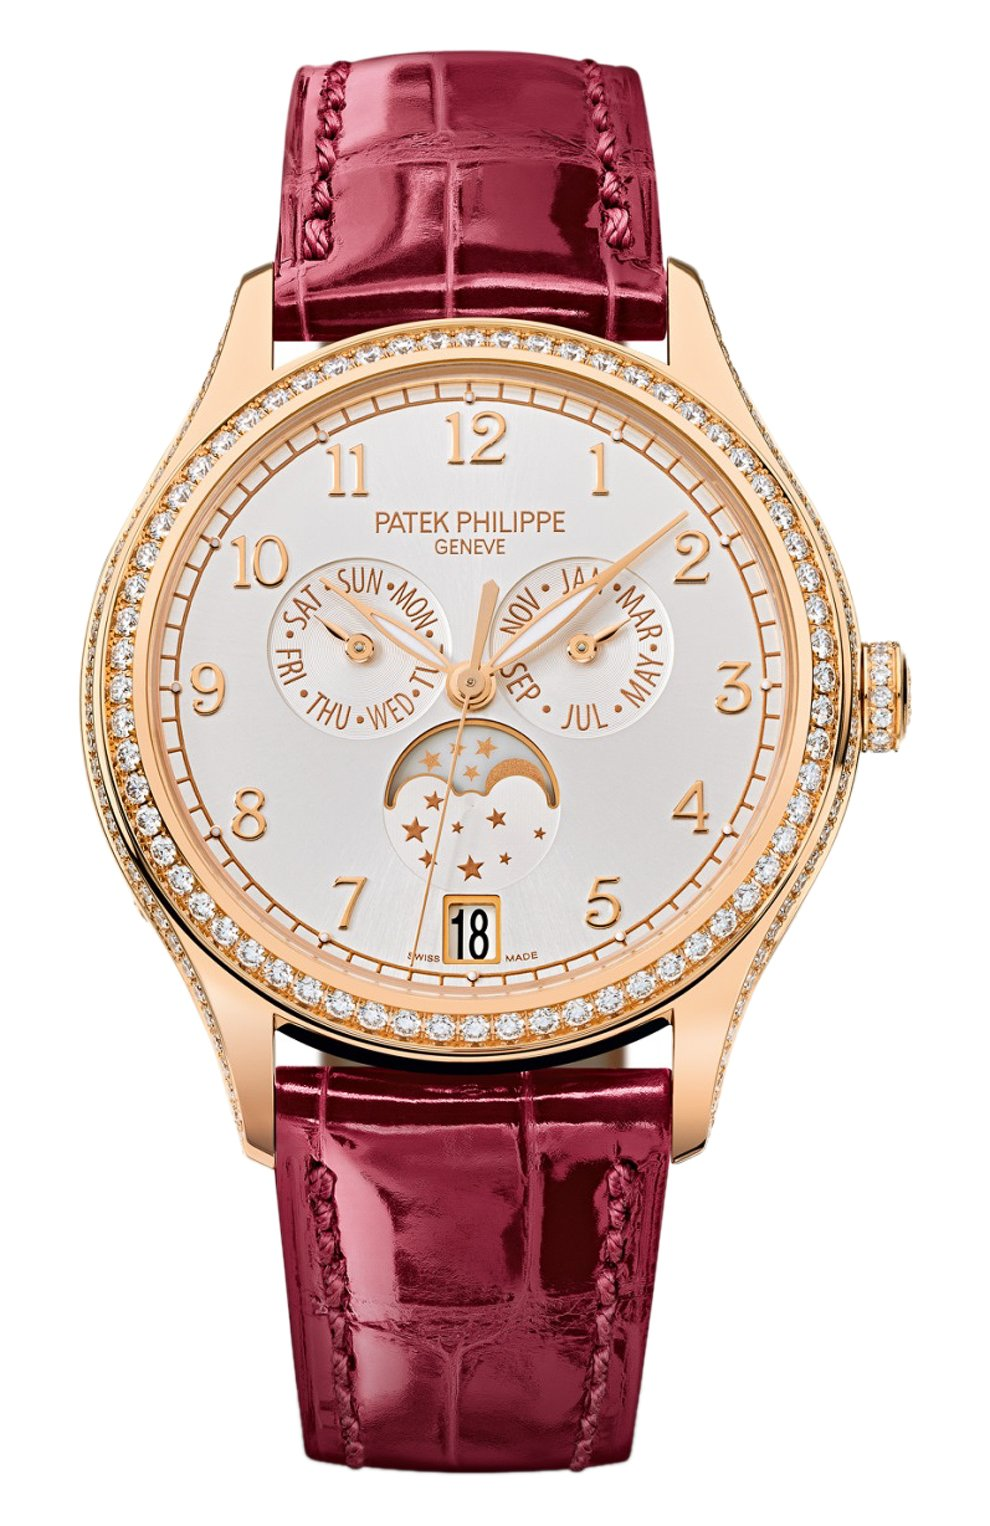 Женские часы moon phase rose gold PATEK PHILIPPE бесцветного цвета, арт. 4947 R-001 | Фото 1 (Механизм: Автомат; Материал корпуса: Розовое золото; Цвет циферблата: Серебристый)